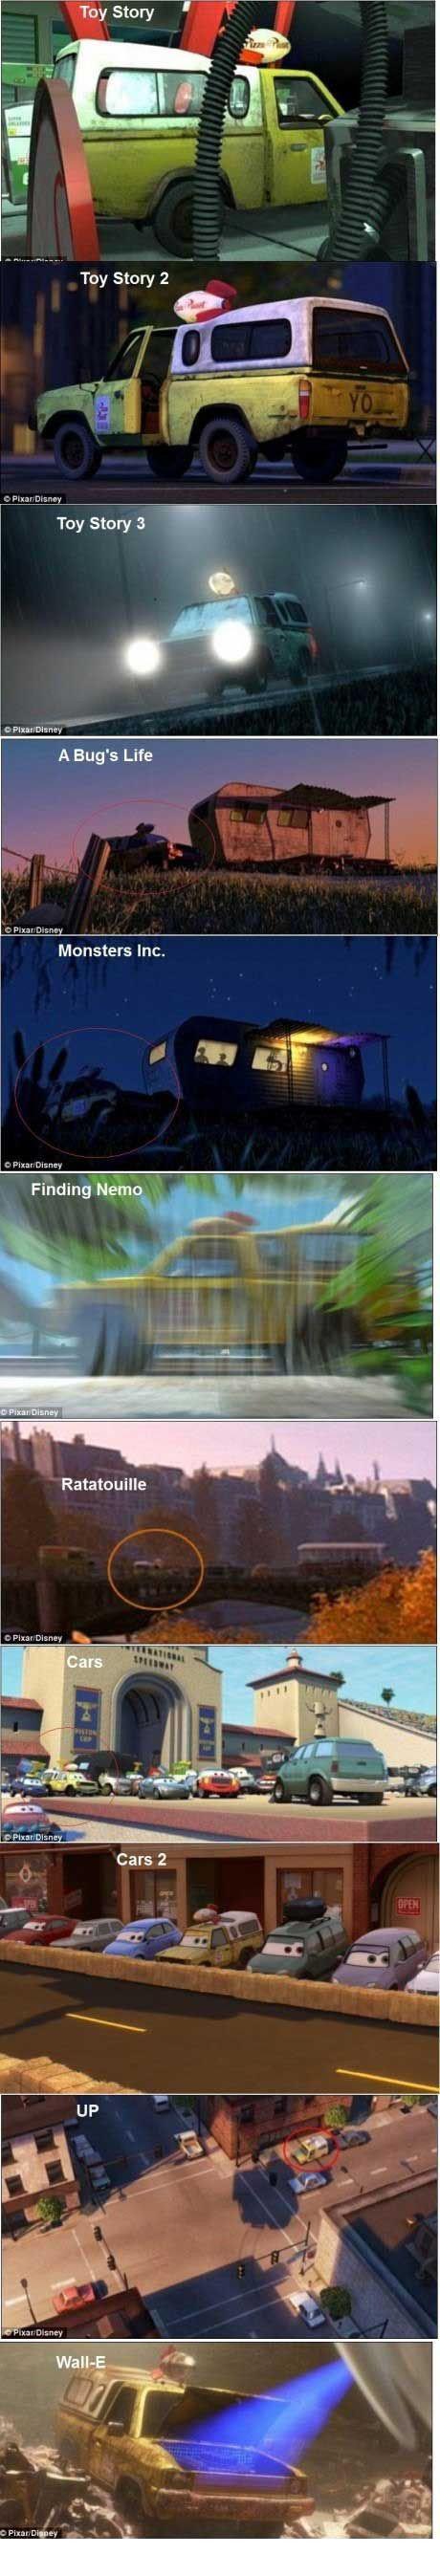 Pizza Planet. . Tay Story 3 Plndr. r? ihatey A Bug' s Lite Monsters inc. i 2' Pilaf Disney b rm Ratatouille i E F' IJI.: H Disobey C? Paar Dir, FIE